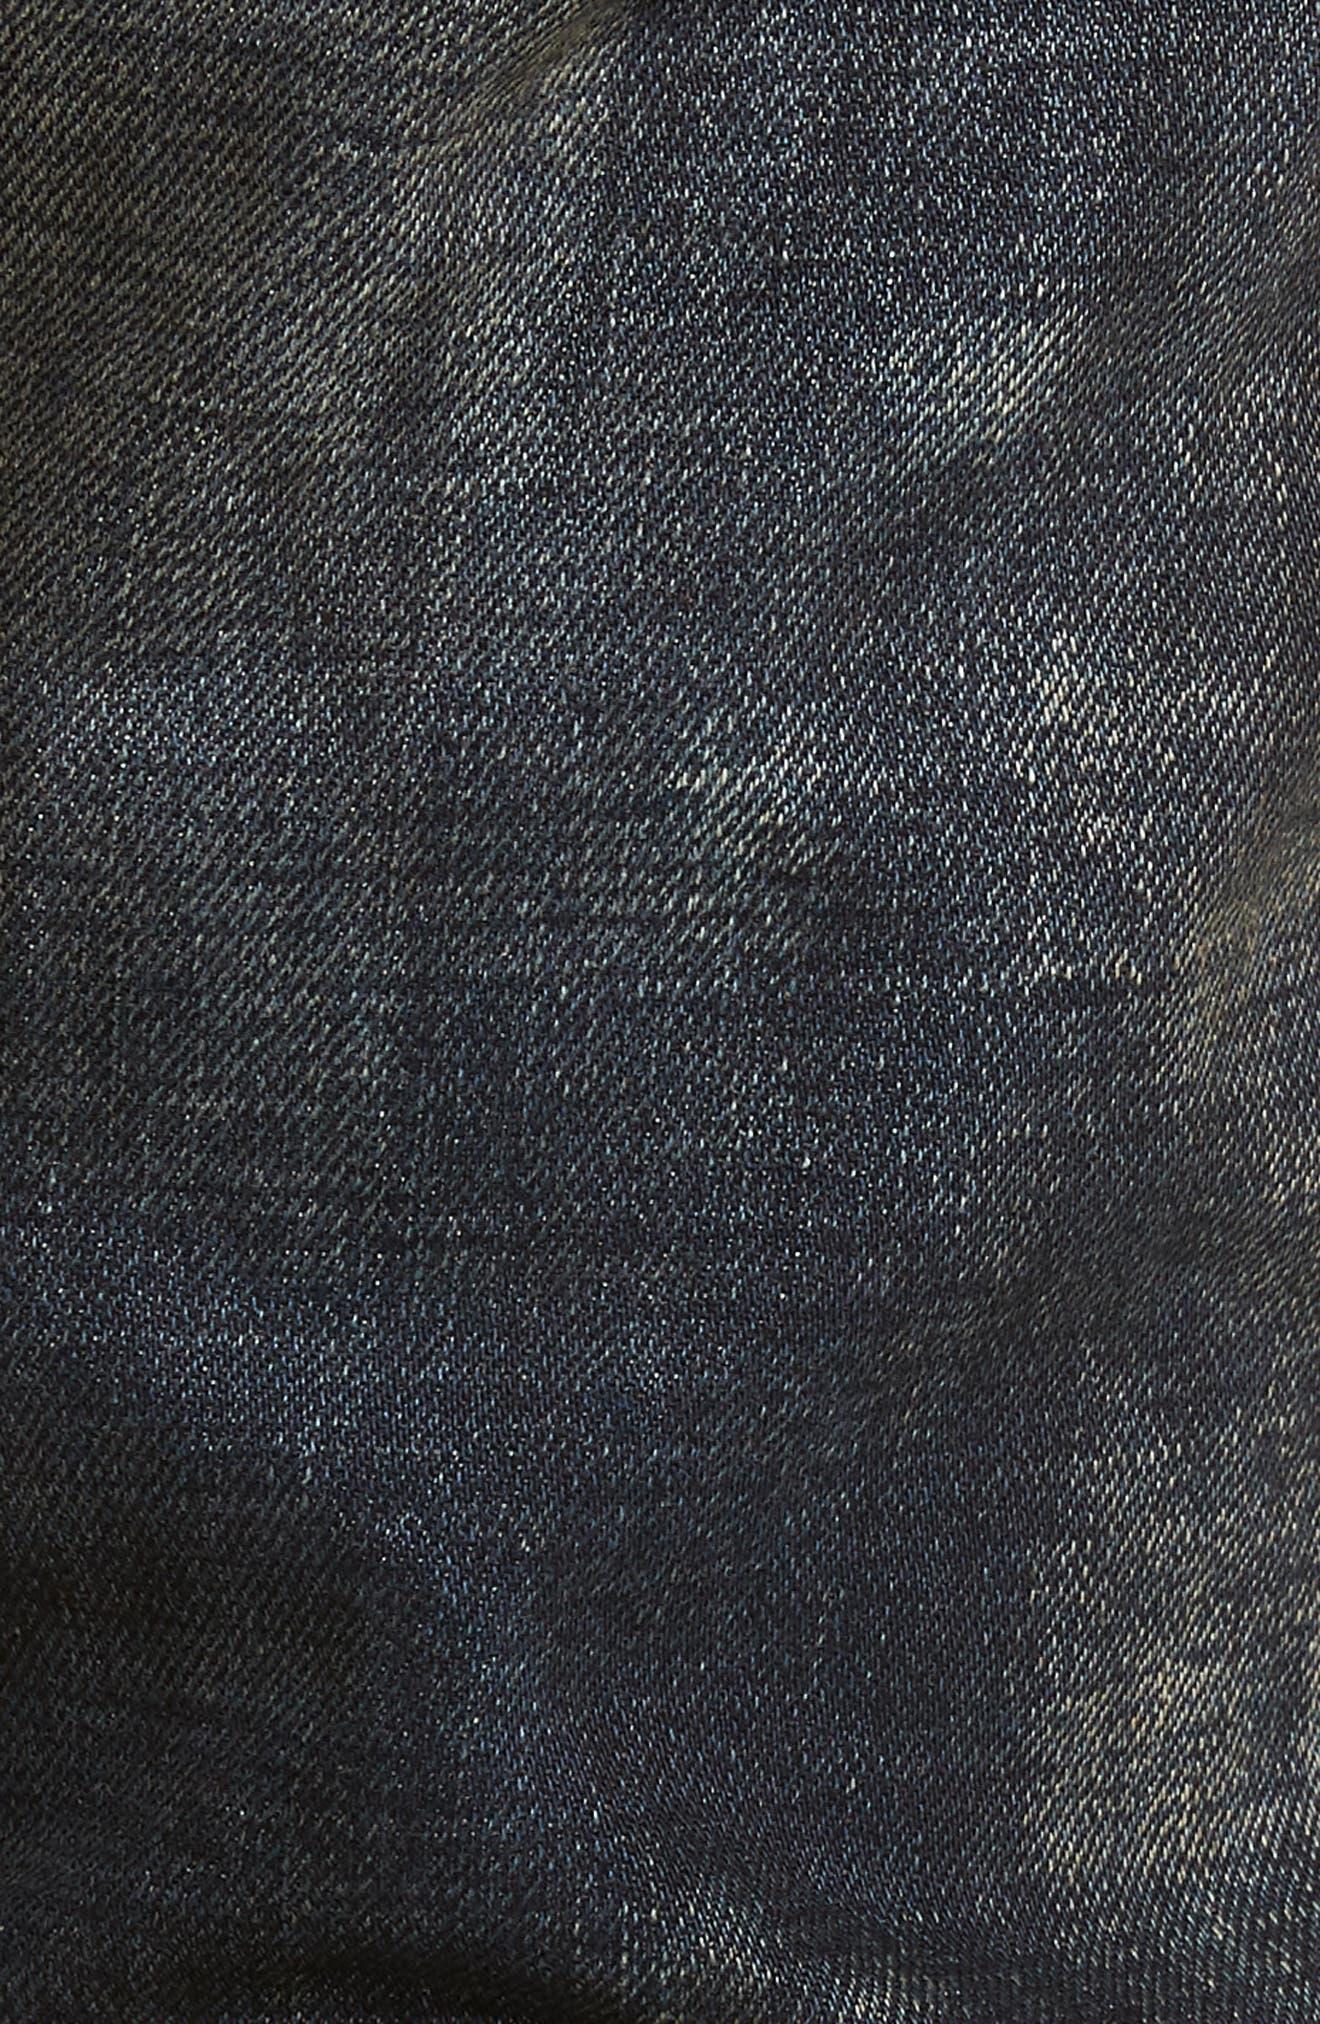 Demon Slim Straight Fit Jeans,                             Alternate thumbnail 5, color,                             Linger